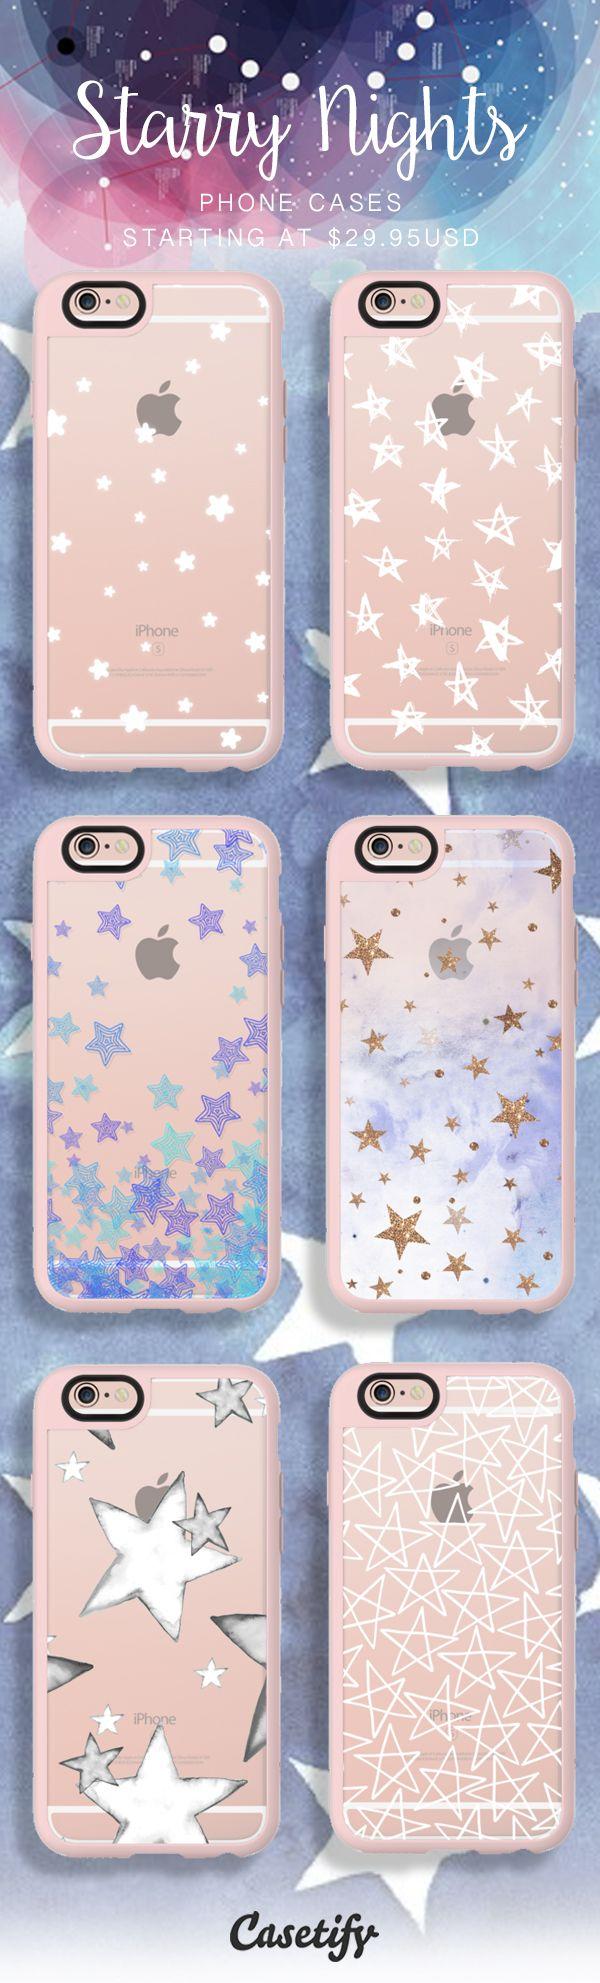 mobile case designs 13